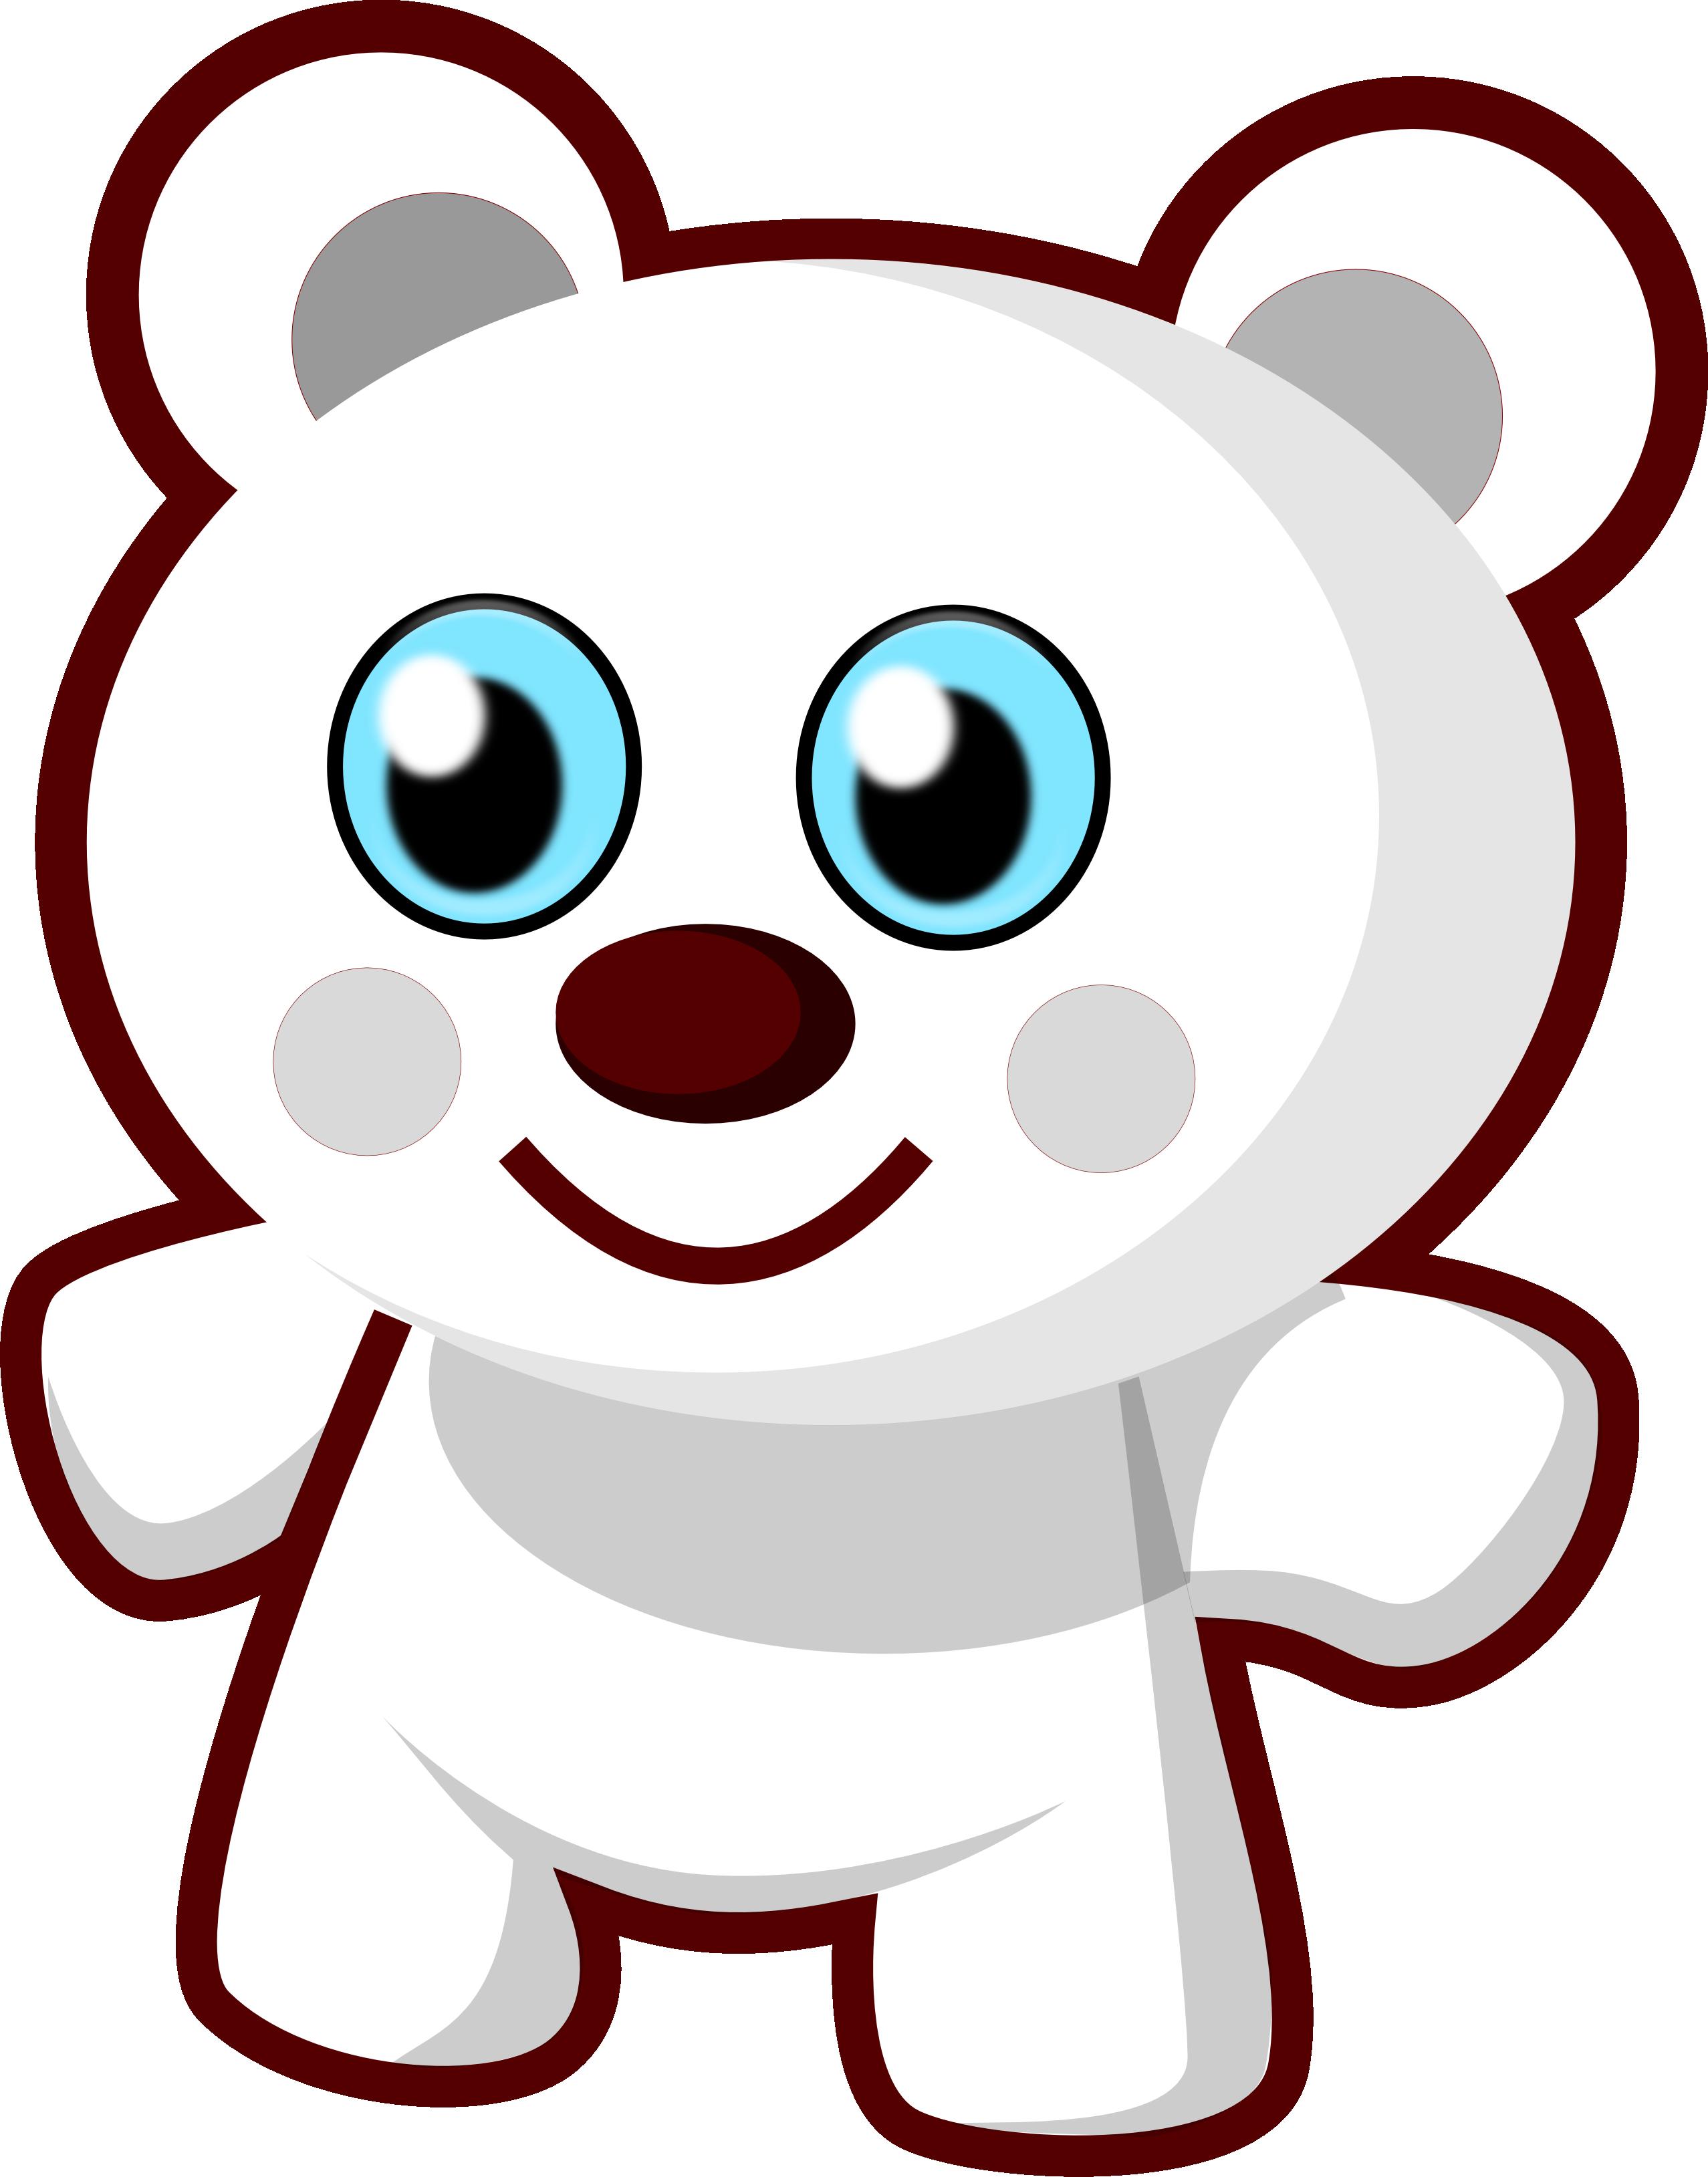 2555x3257 Cute Lion Clipart Black And White Clipart Panda